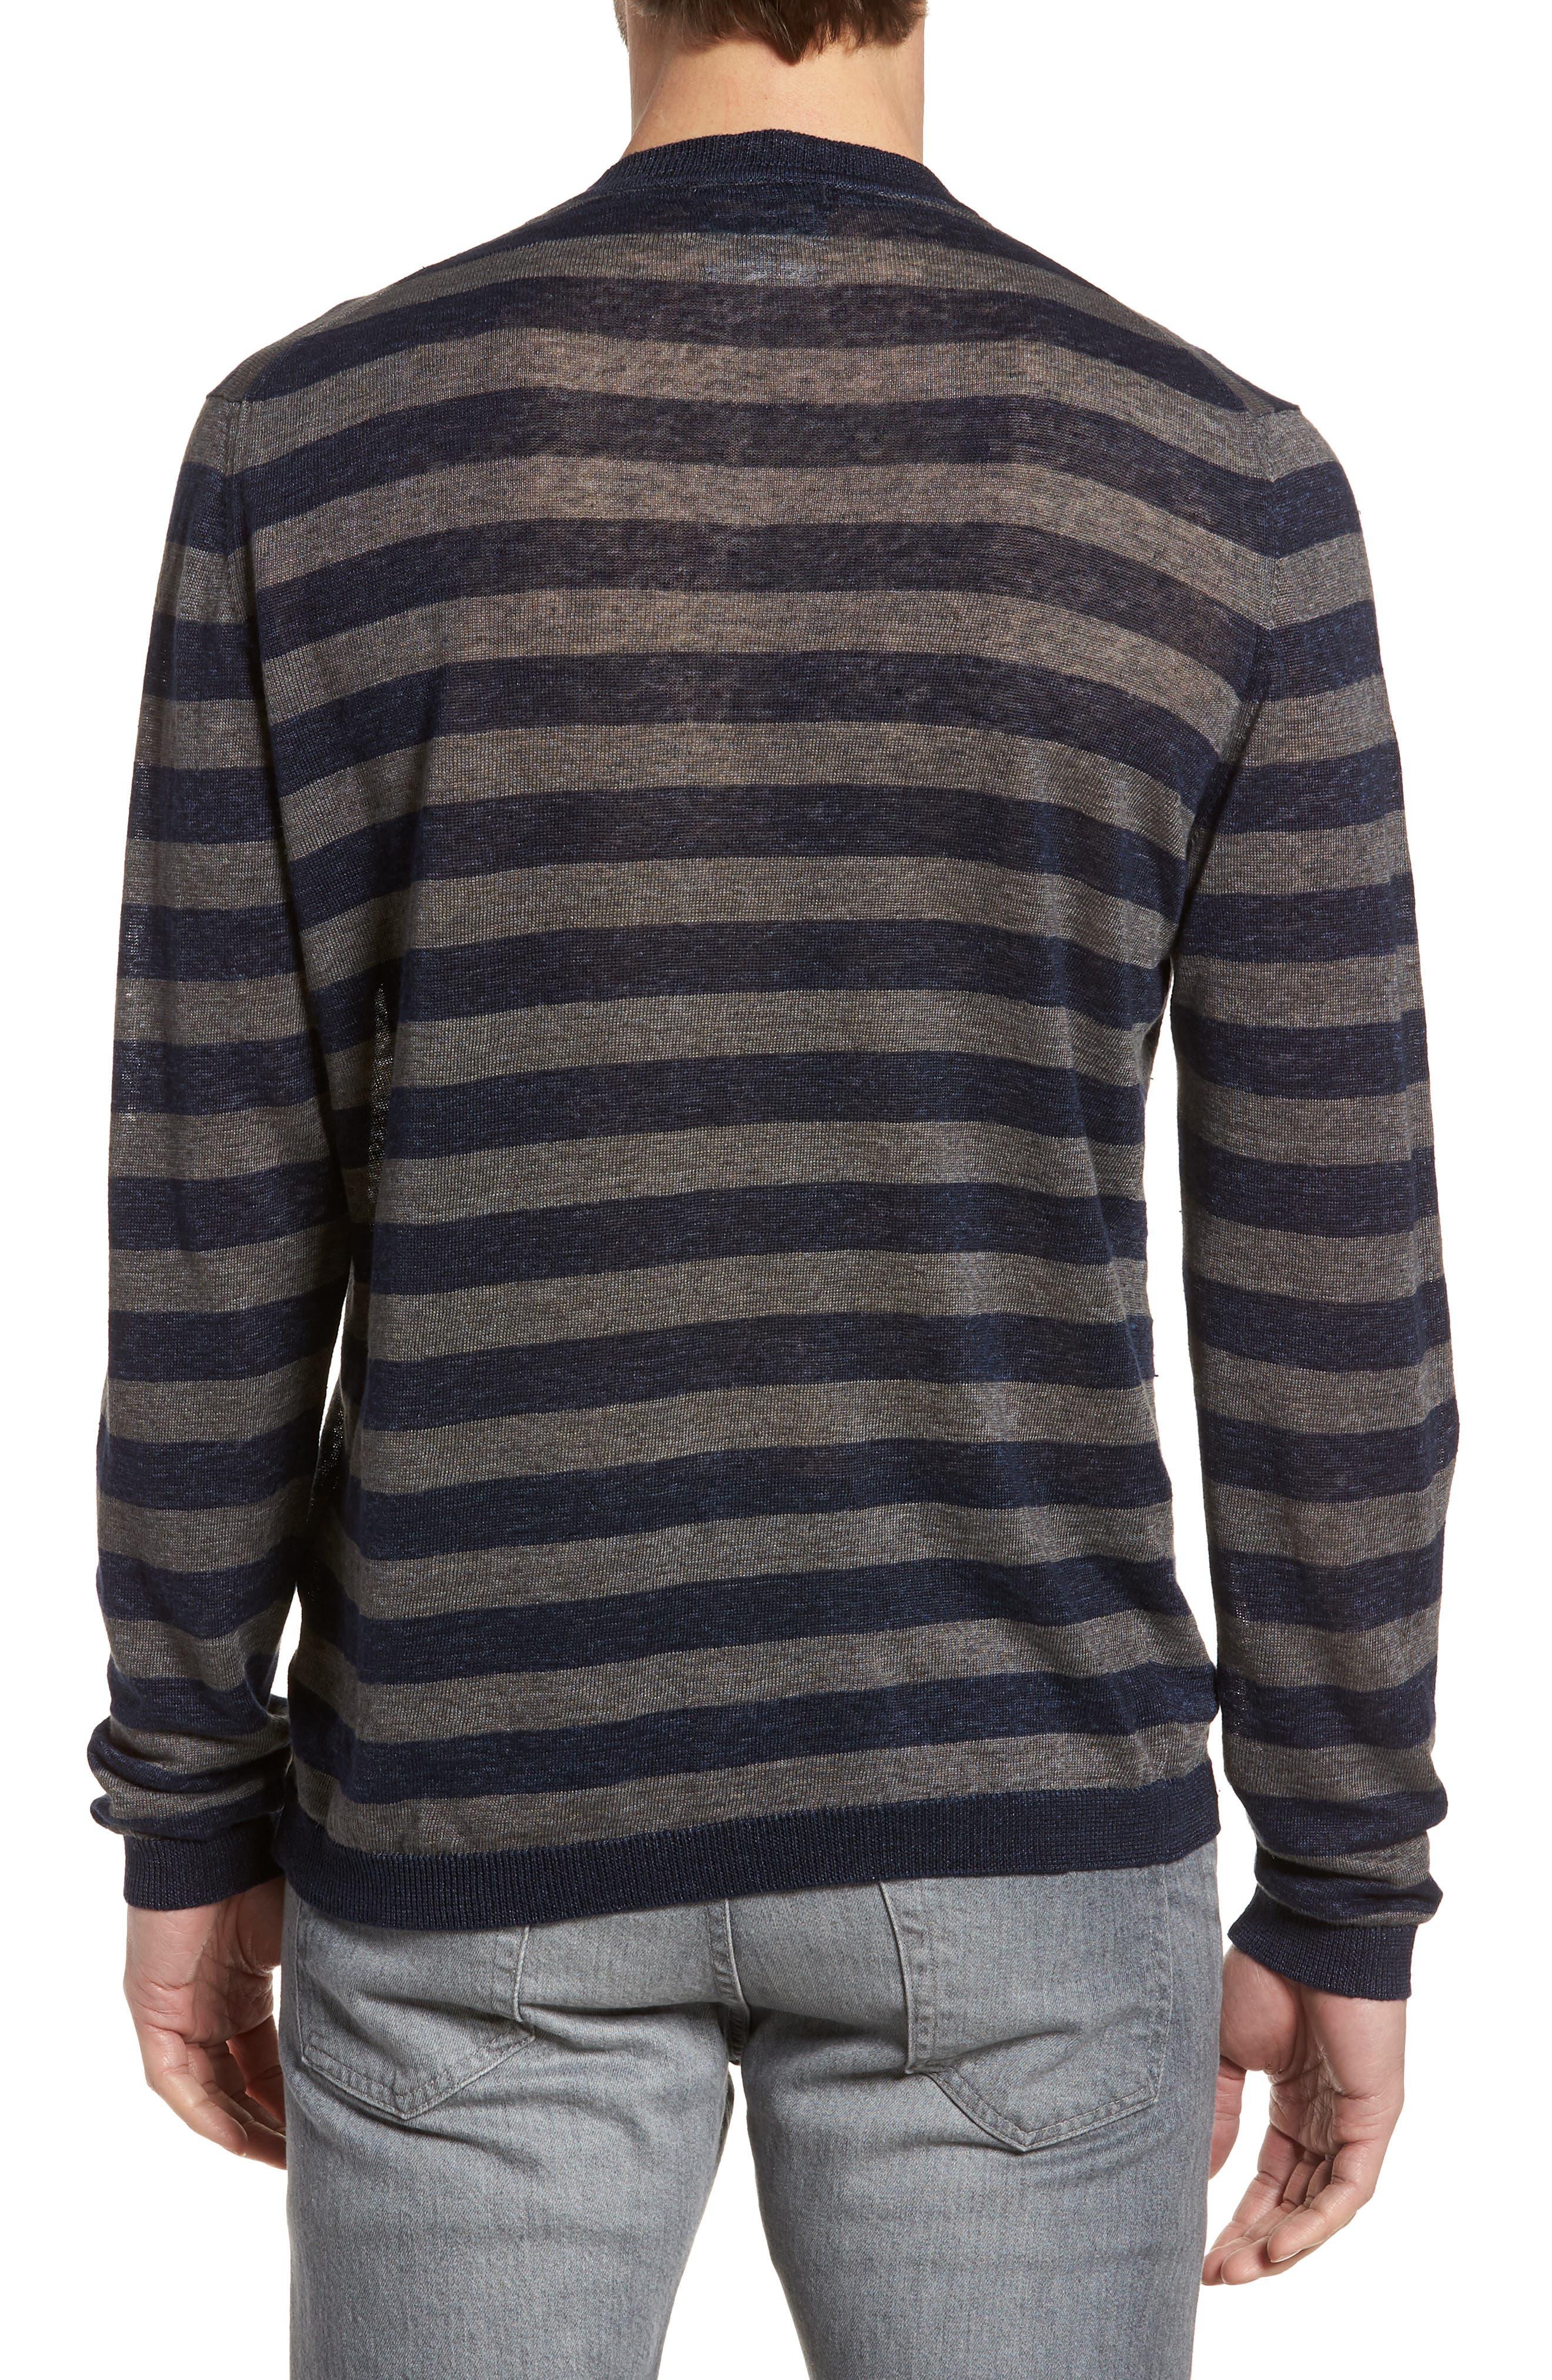 & Bros. Stripe Linen Sweater,                             Alternate thumbnail 2, color,